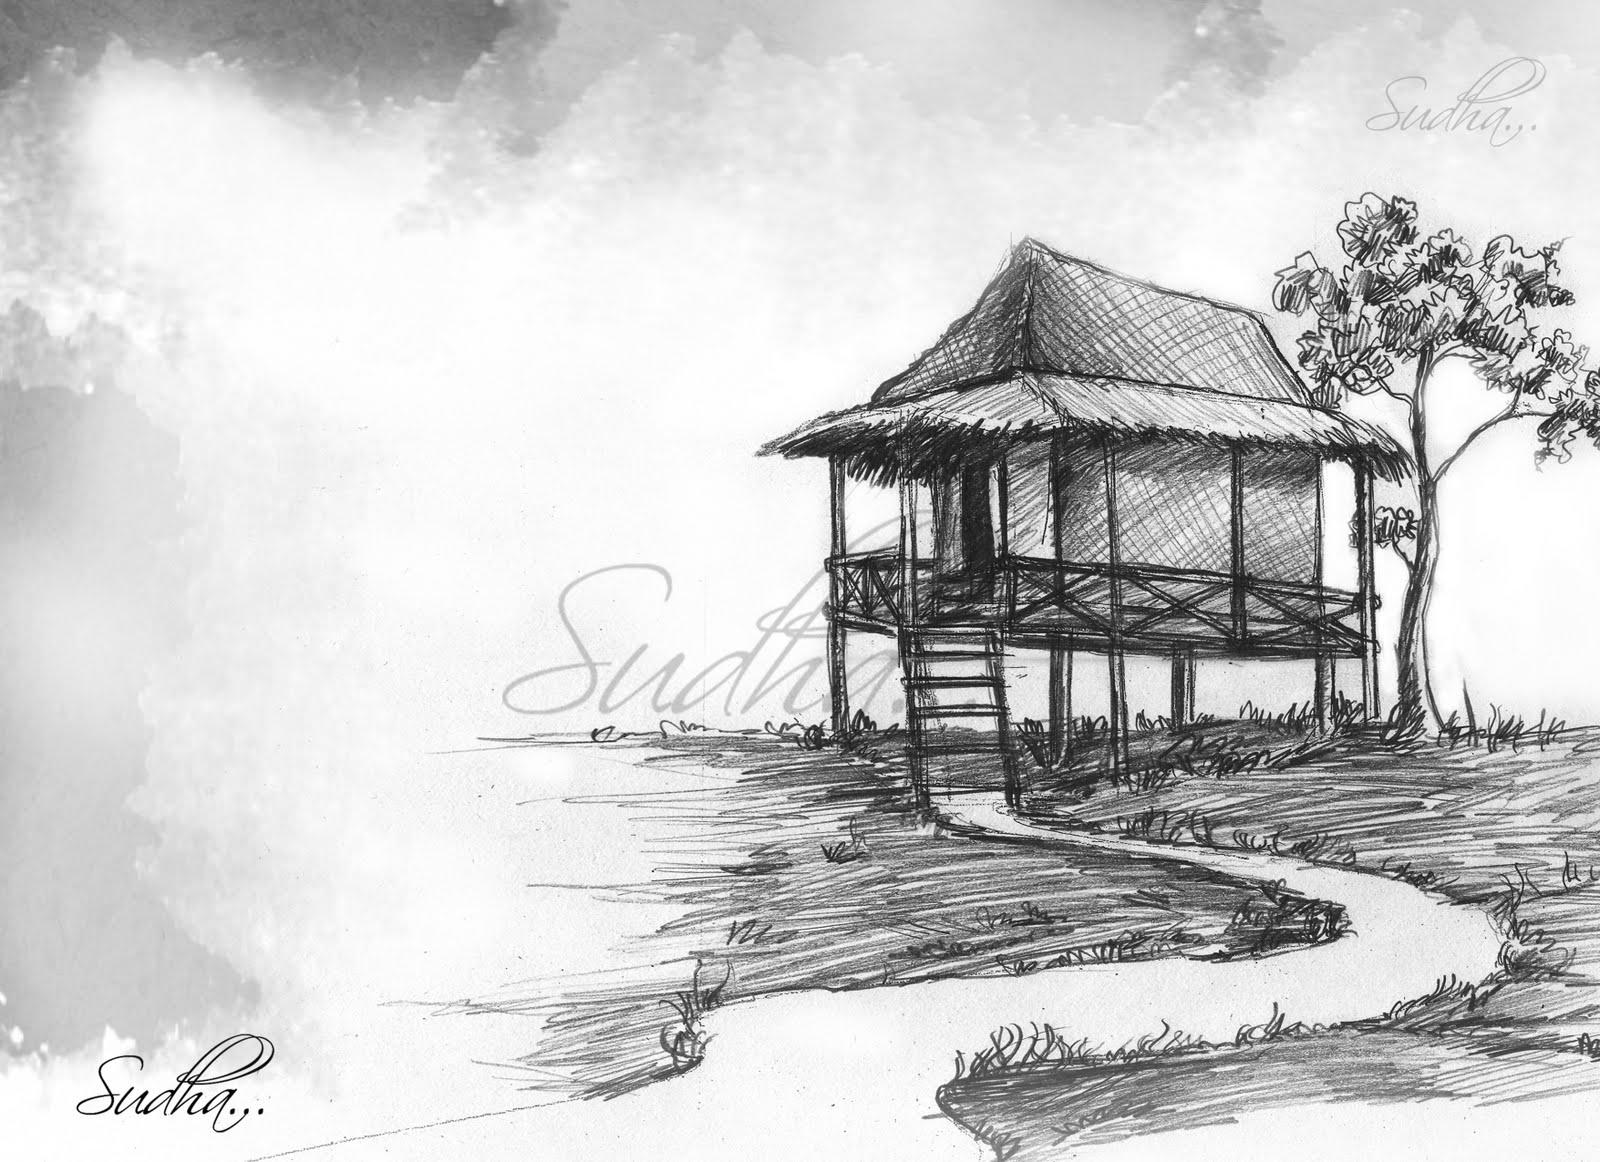 Pencil Drawings Village Pencildrawing2019 Beautiful scenery drawing with watercolor. pencildrawing2019